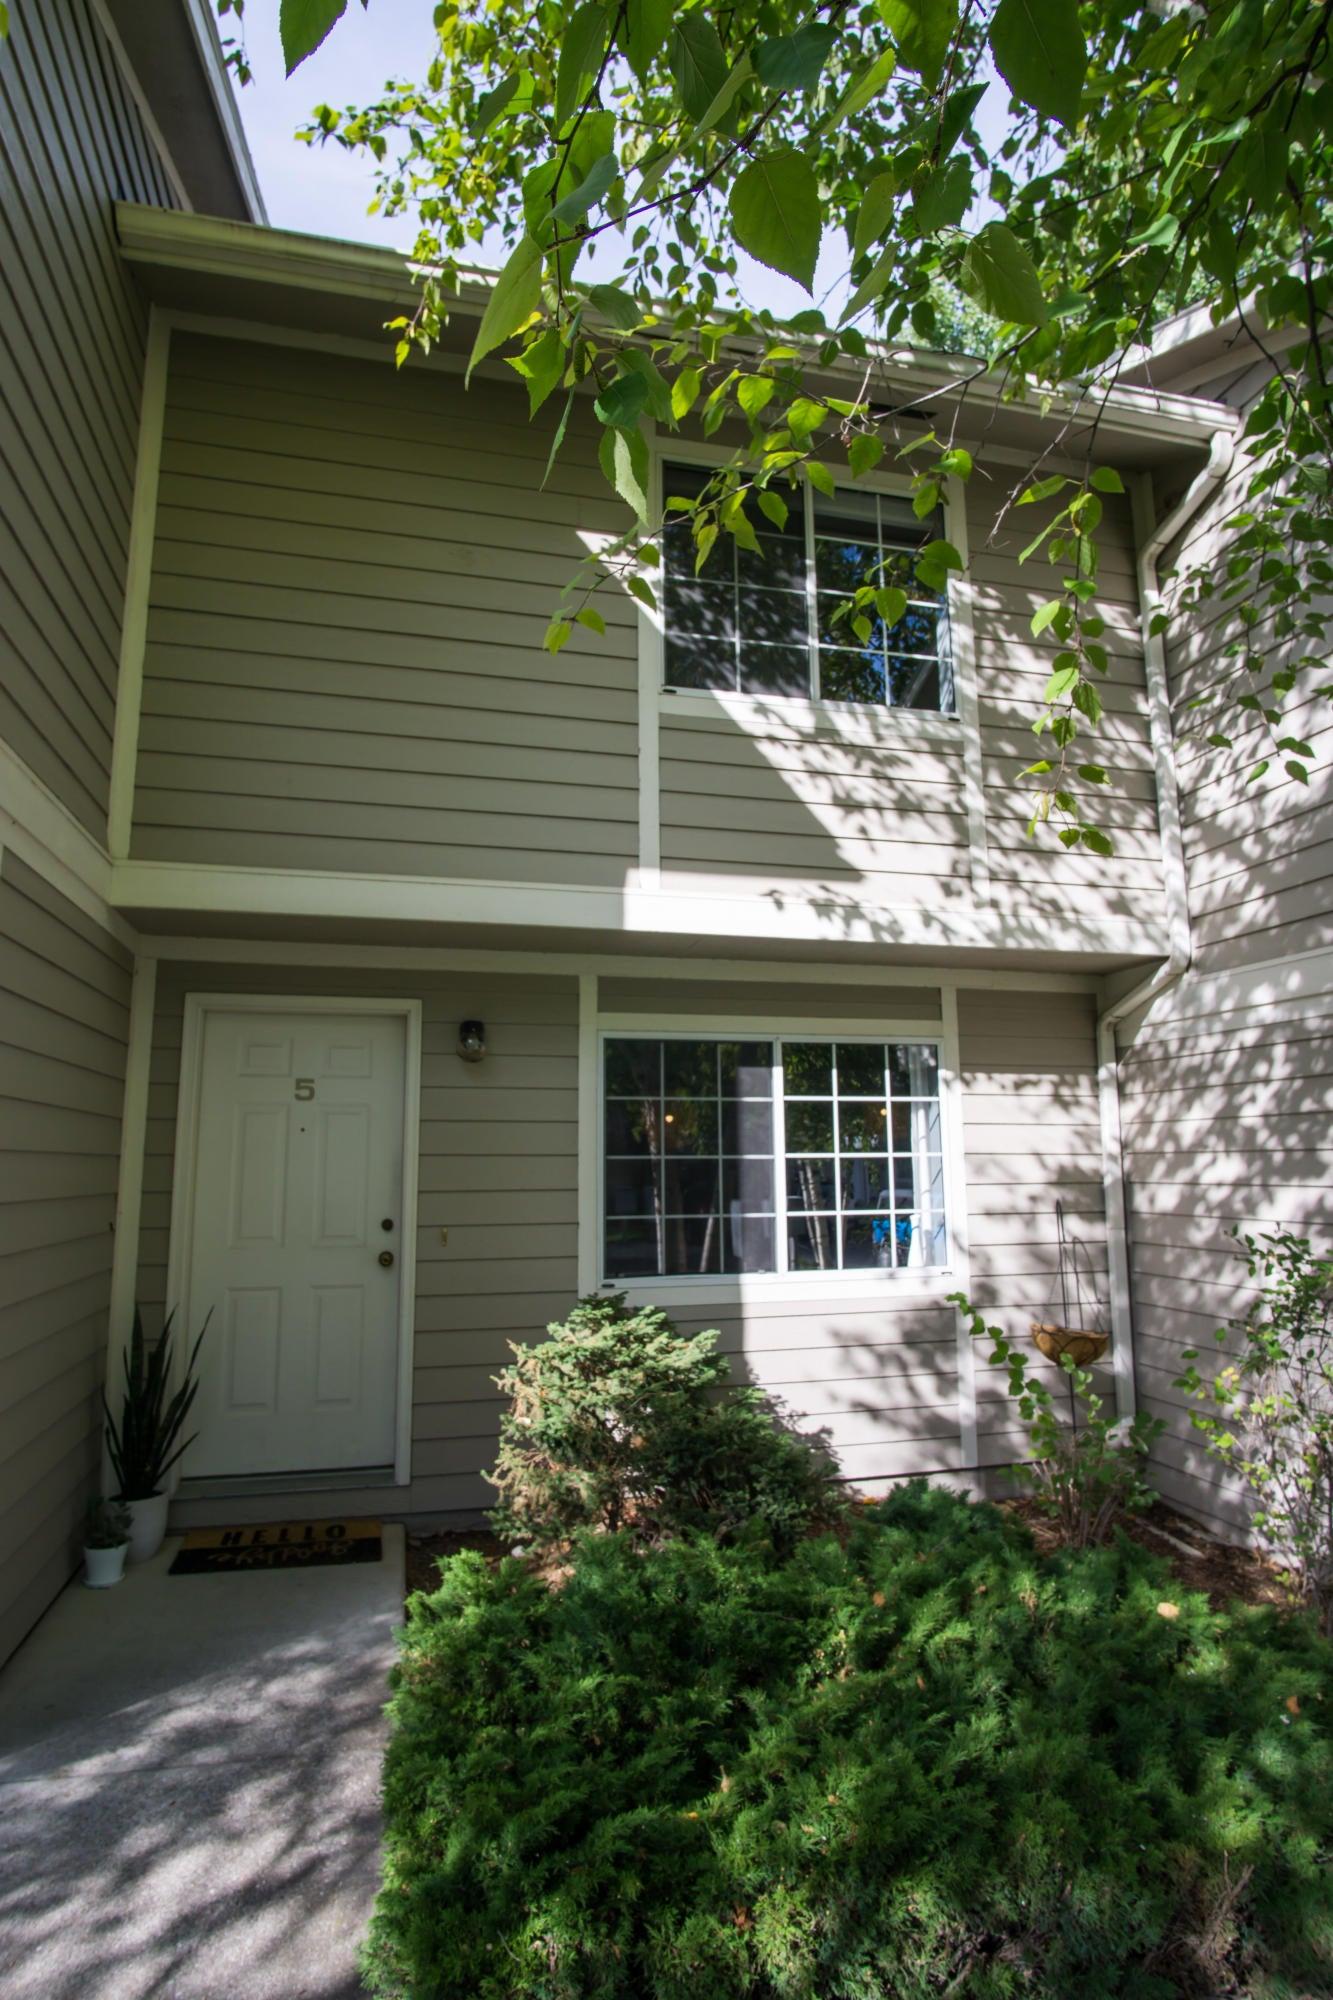 2802 Rockridge Court, Unit 5, Missoula, MT 59808